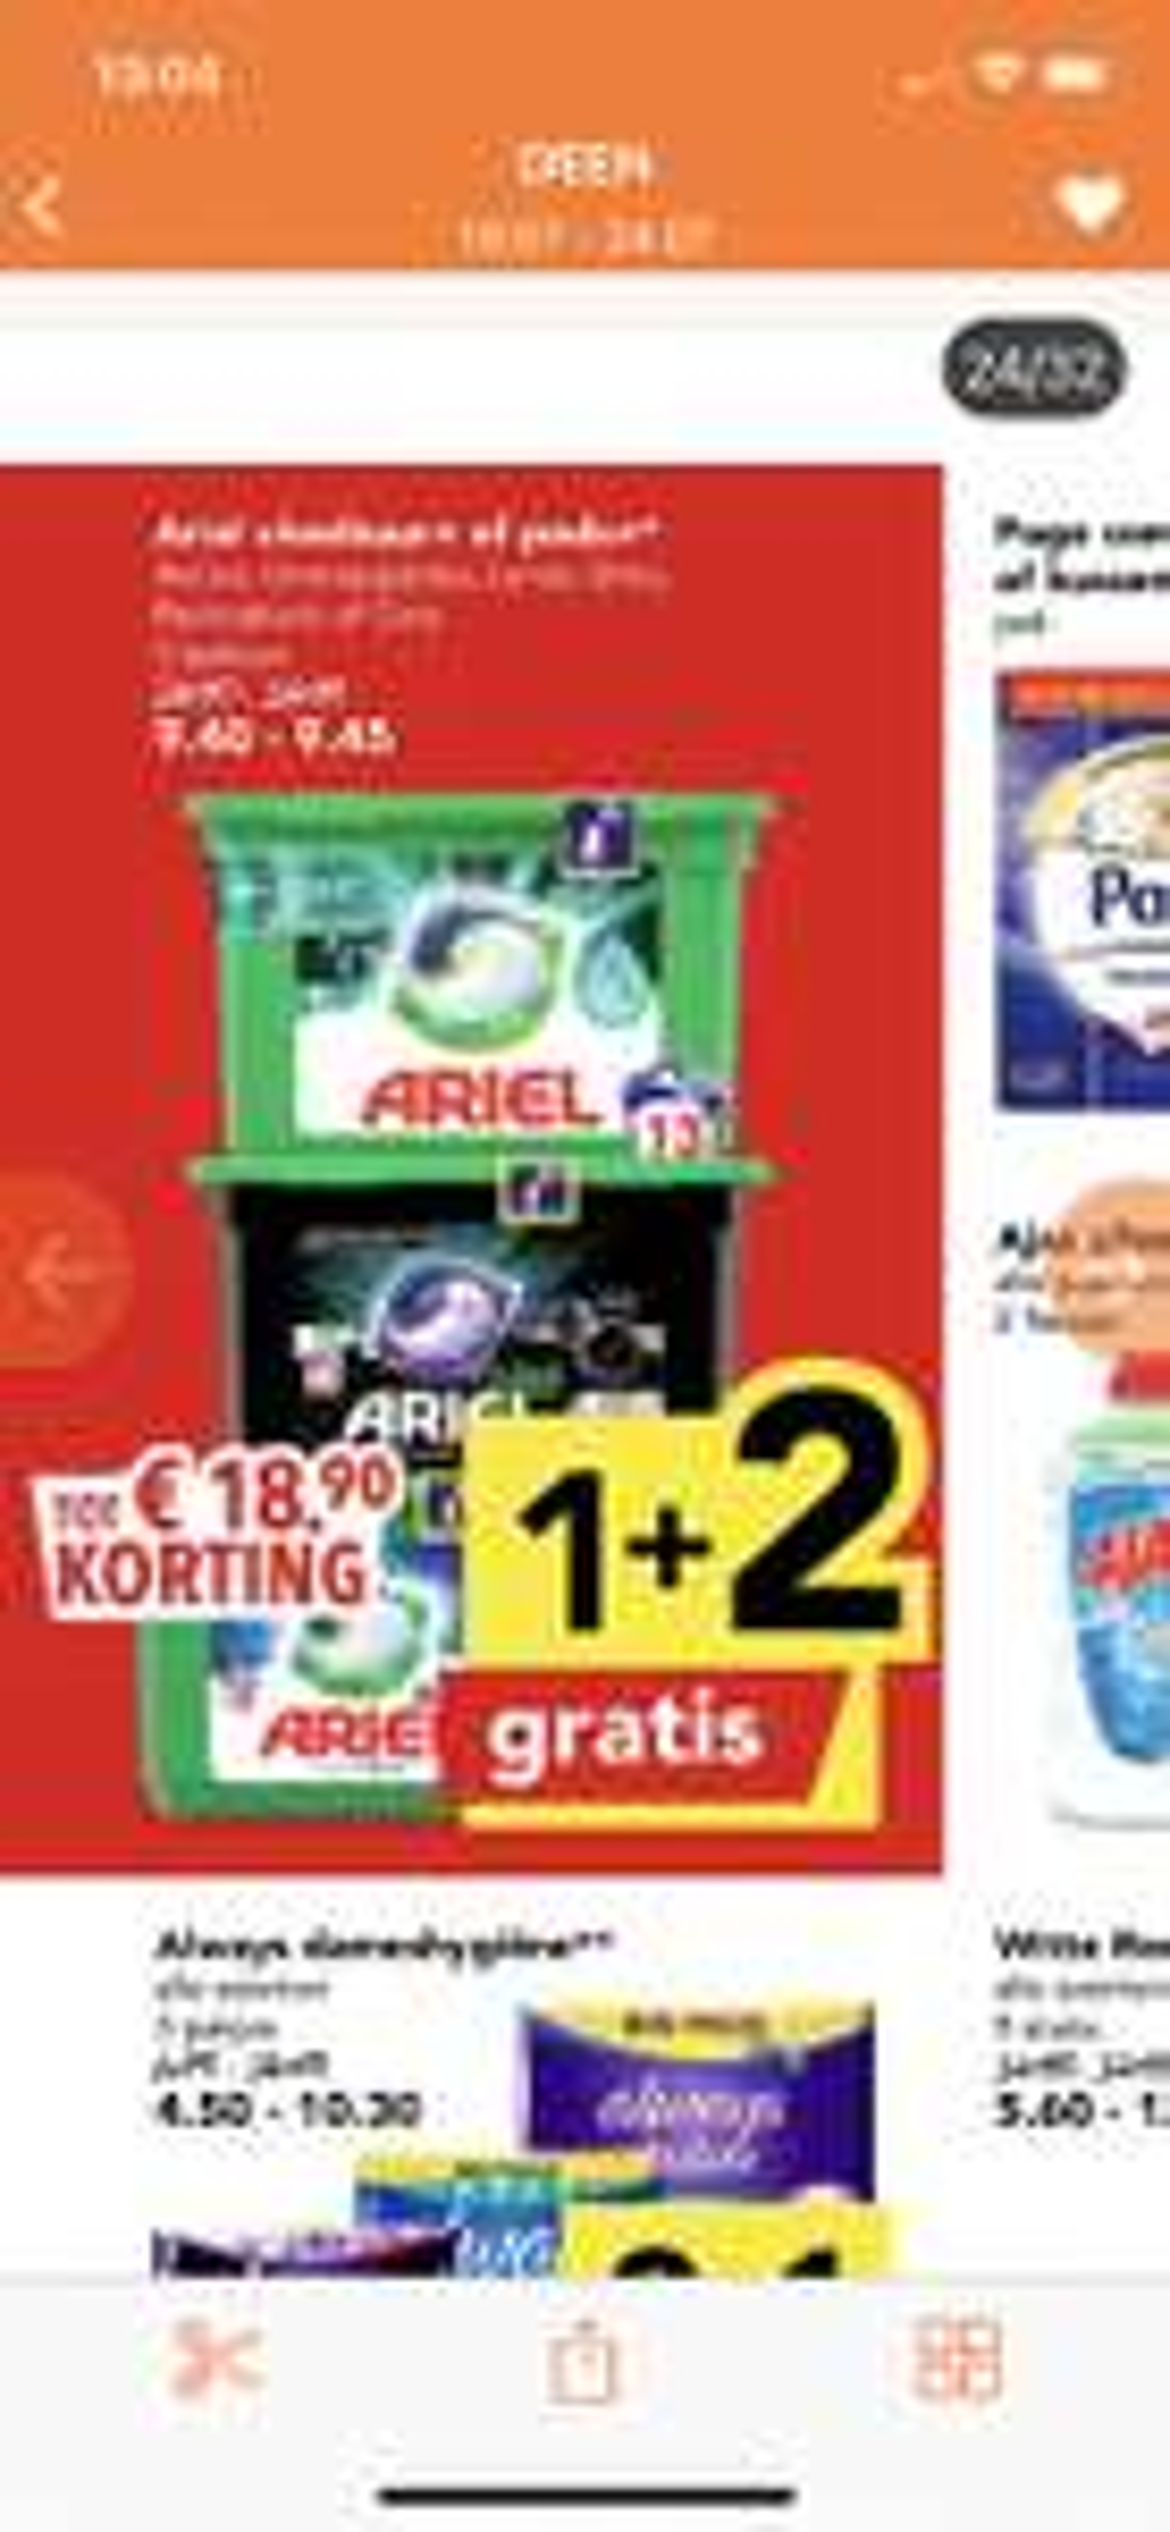 Ariel 1 + 2 gratis